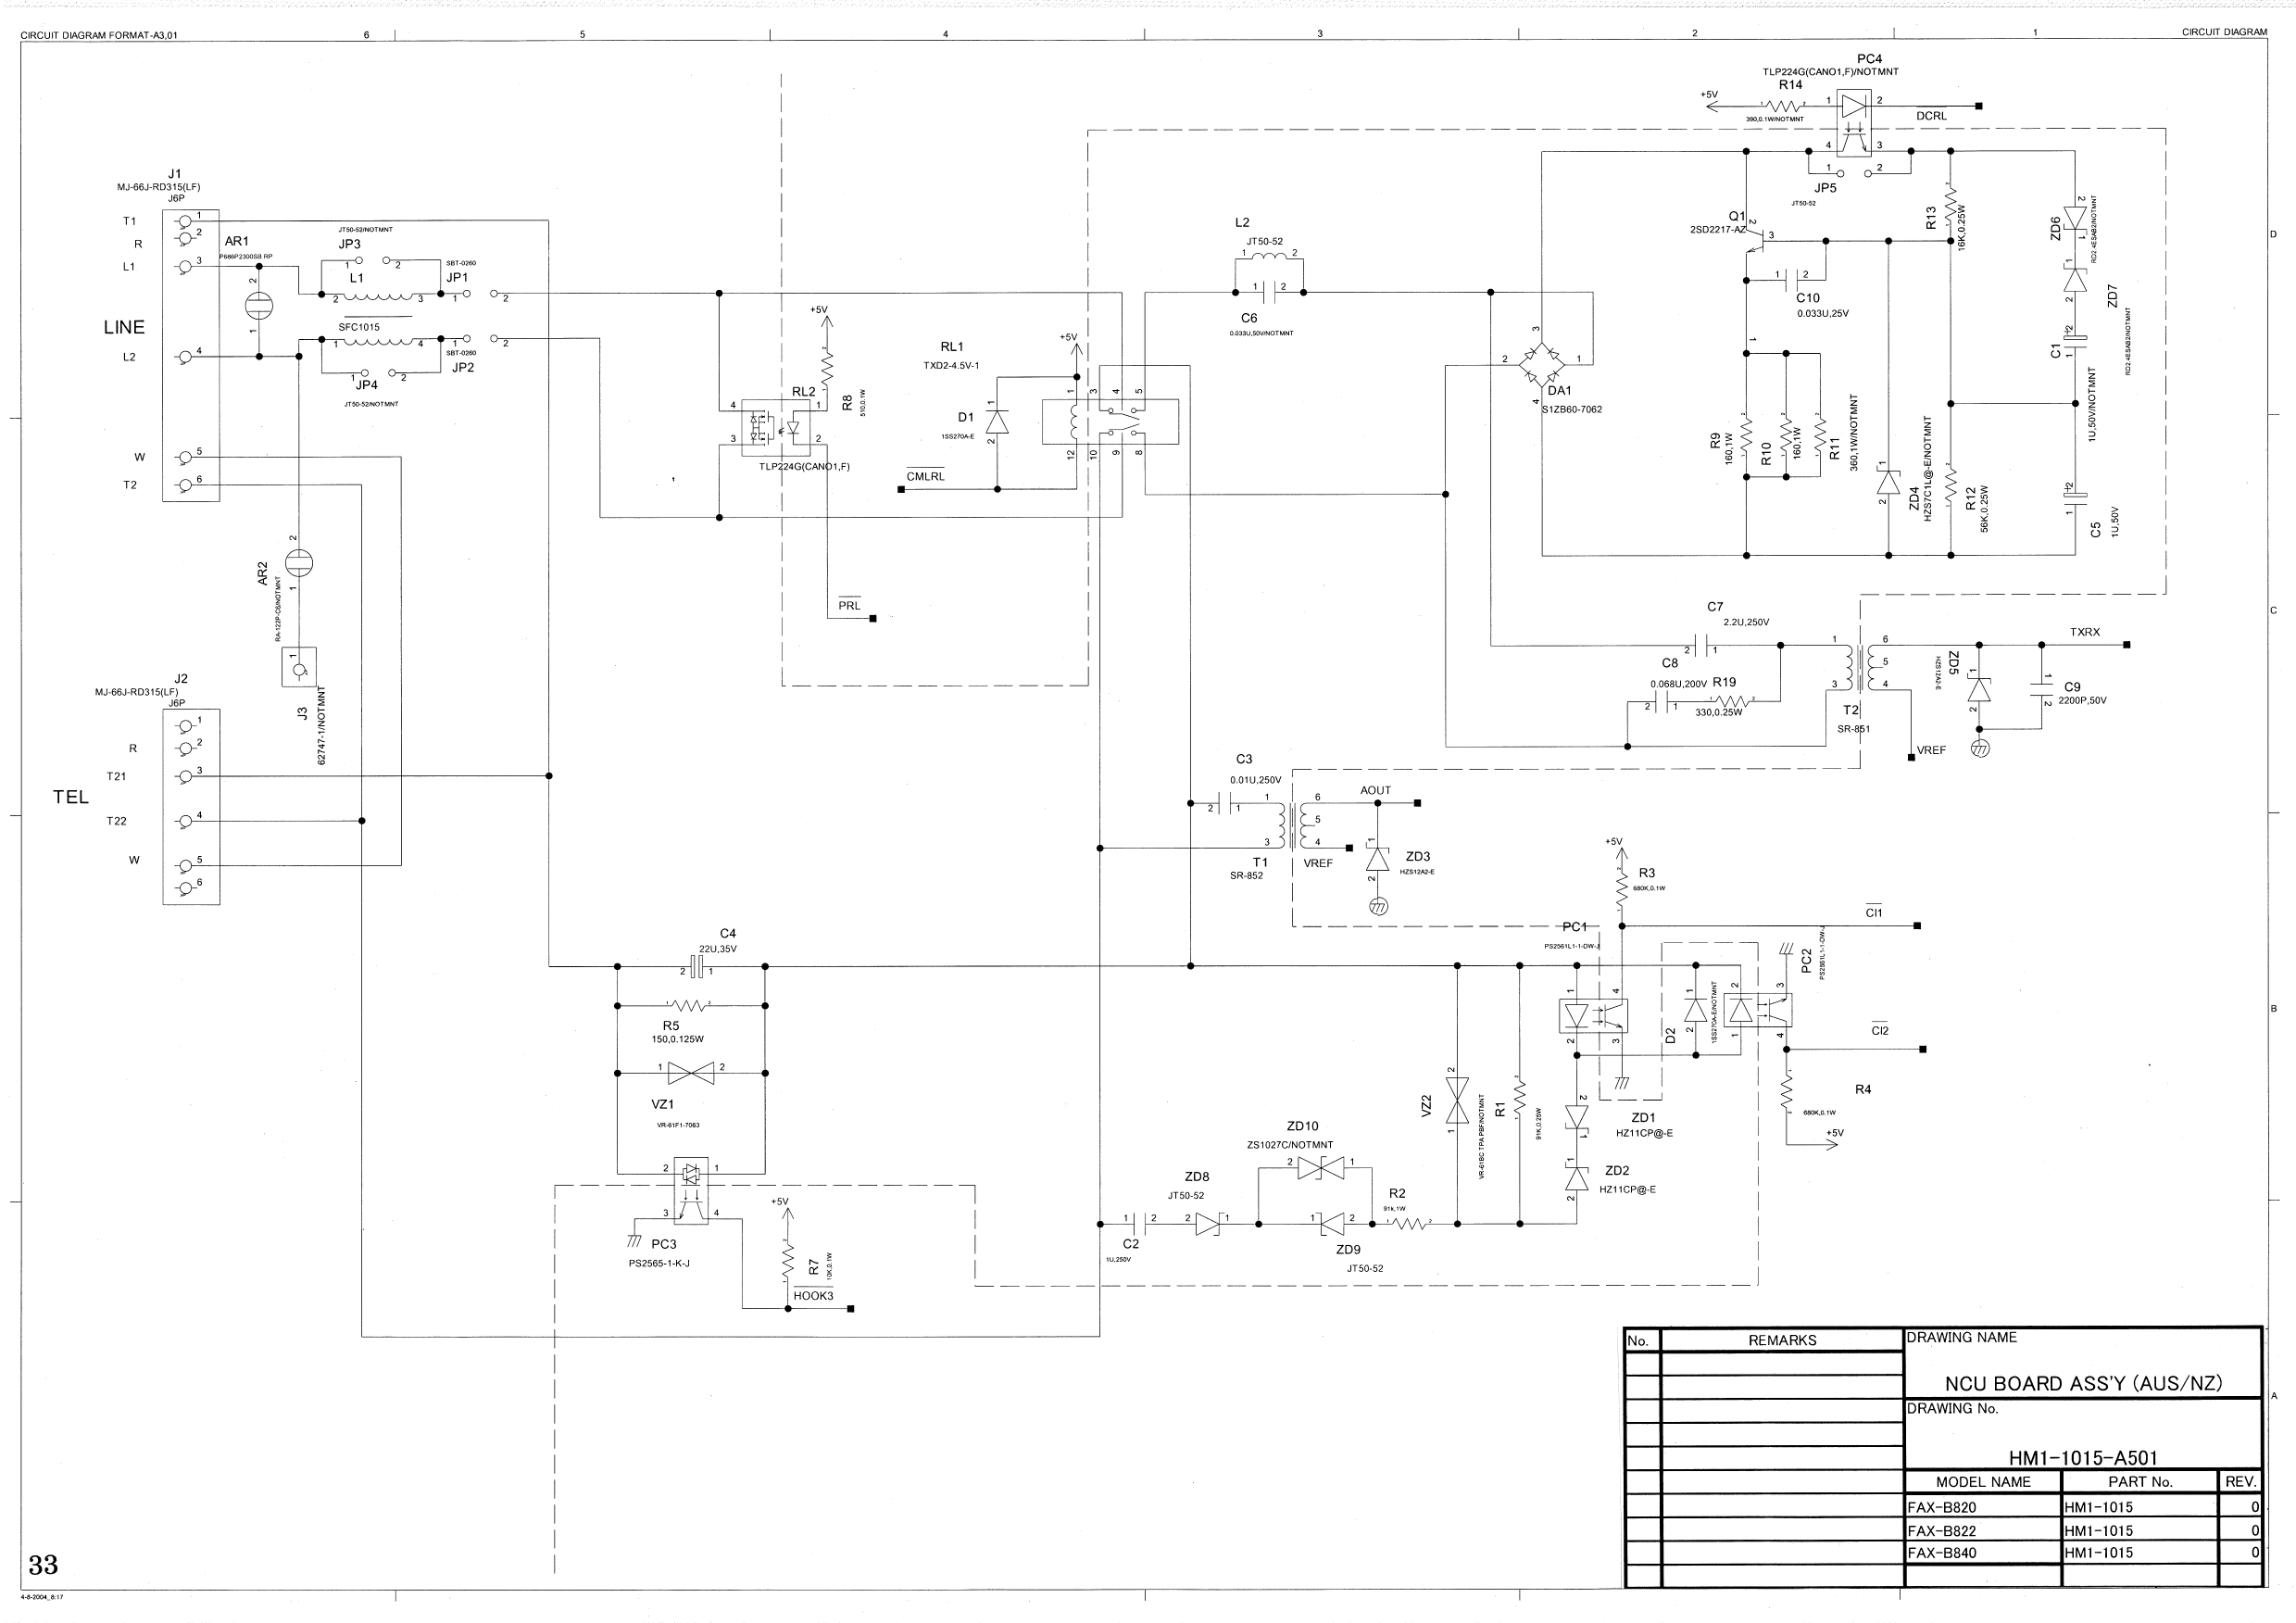 canon fax b820 b822 b840 ncu